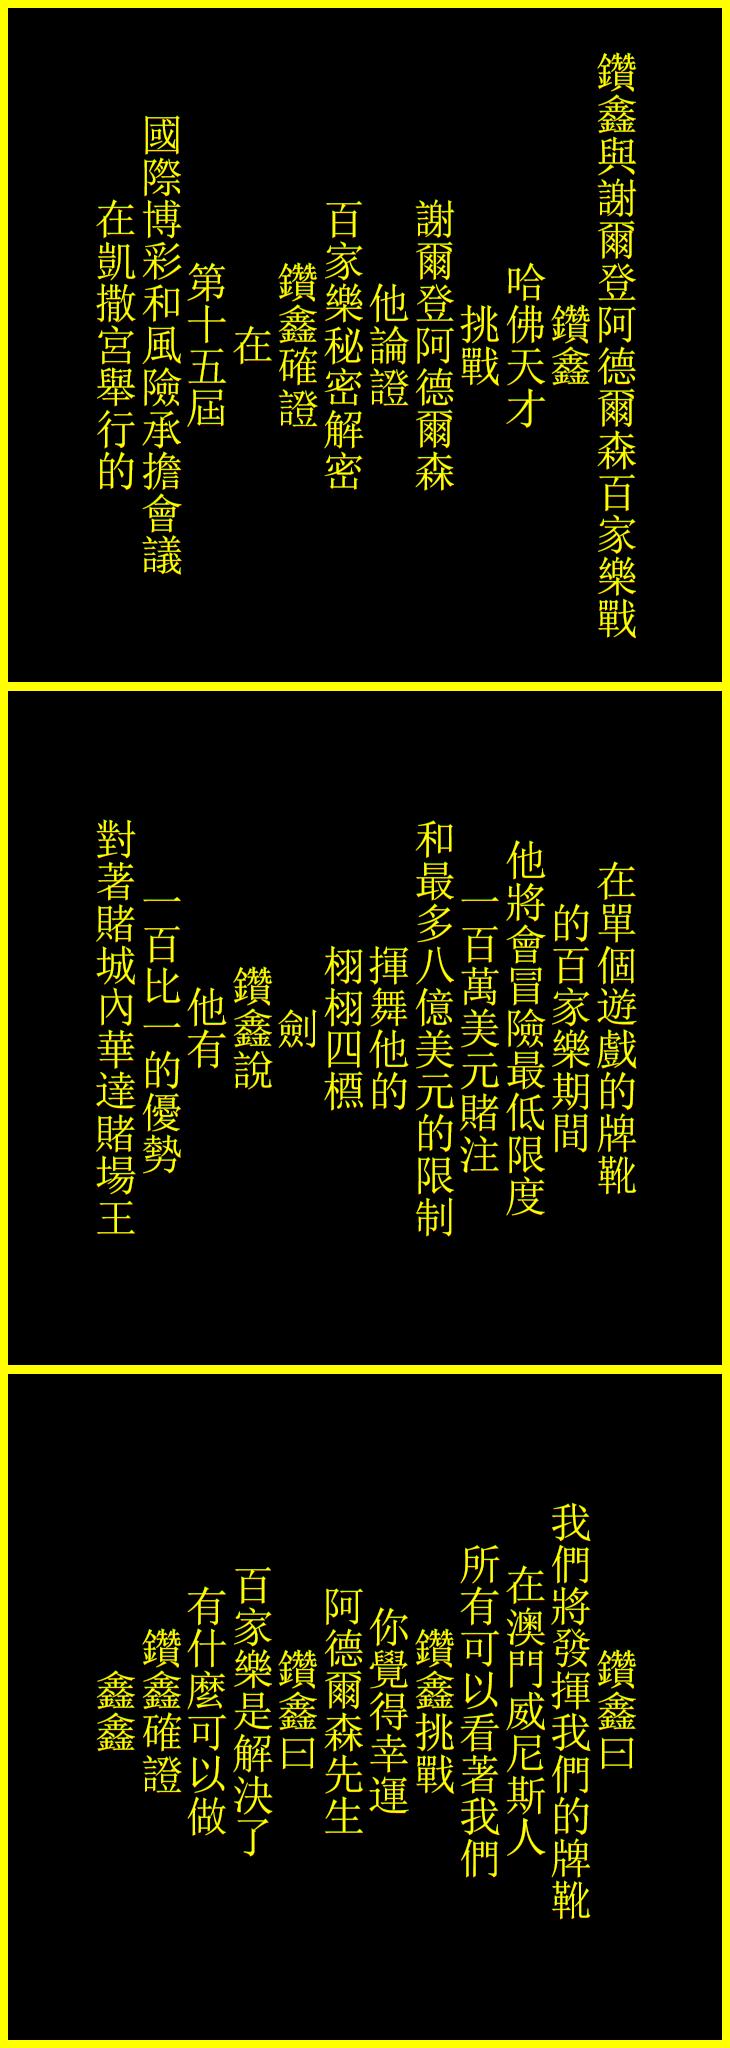 ZUAN XIN CHALLENGES SHELDON ADELSON